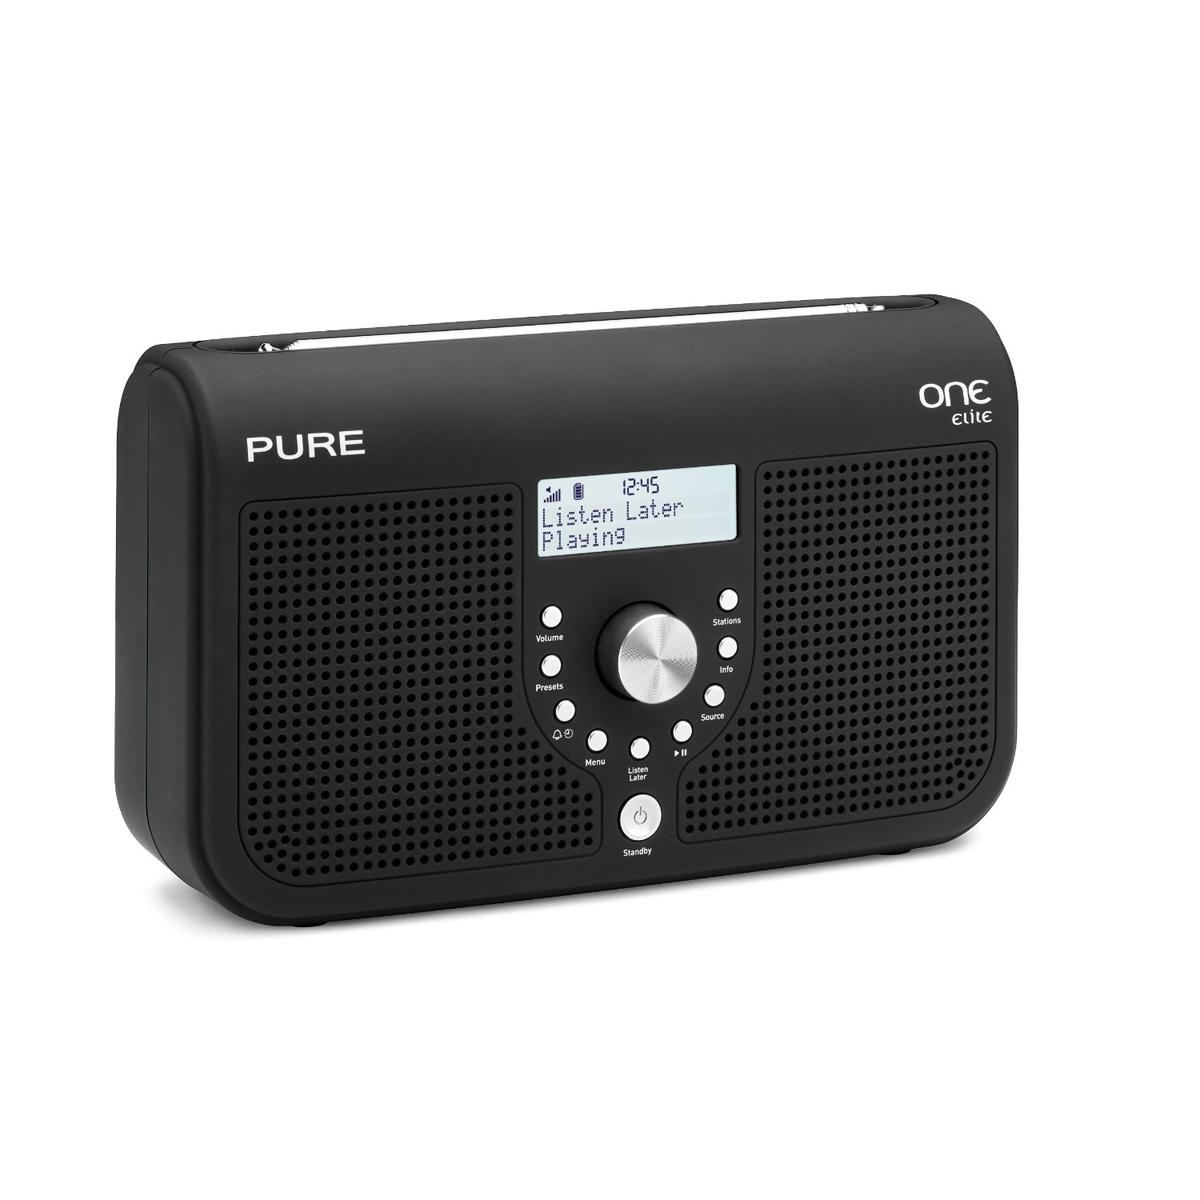 Radio & radio réveil Pure One Elite Series II Noir Radio FM compatible RNT